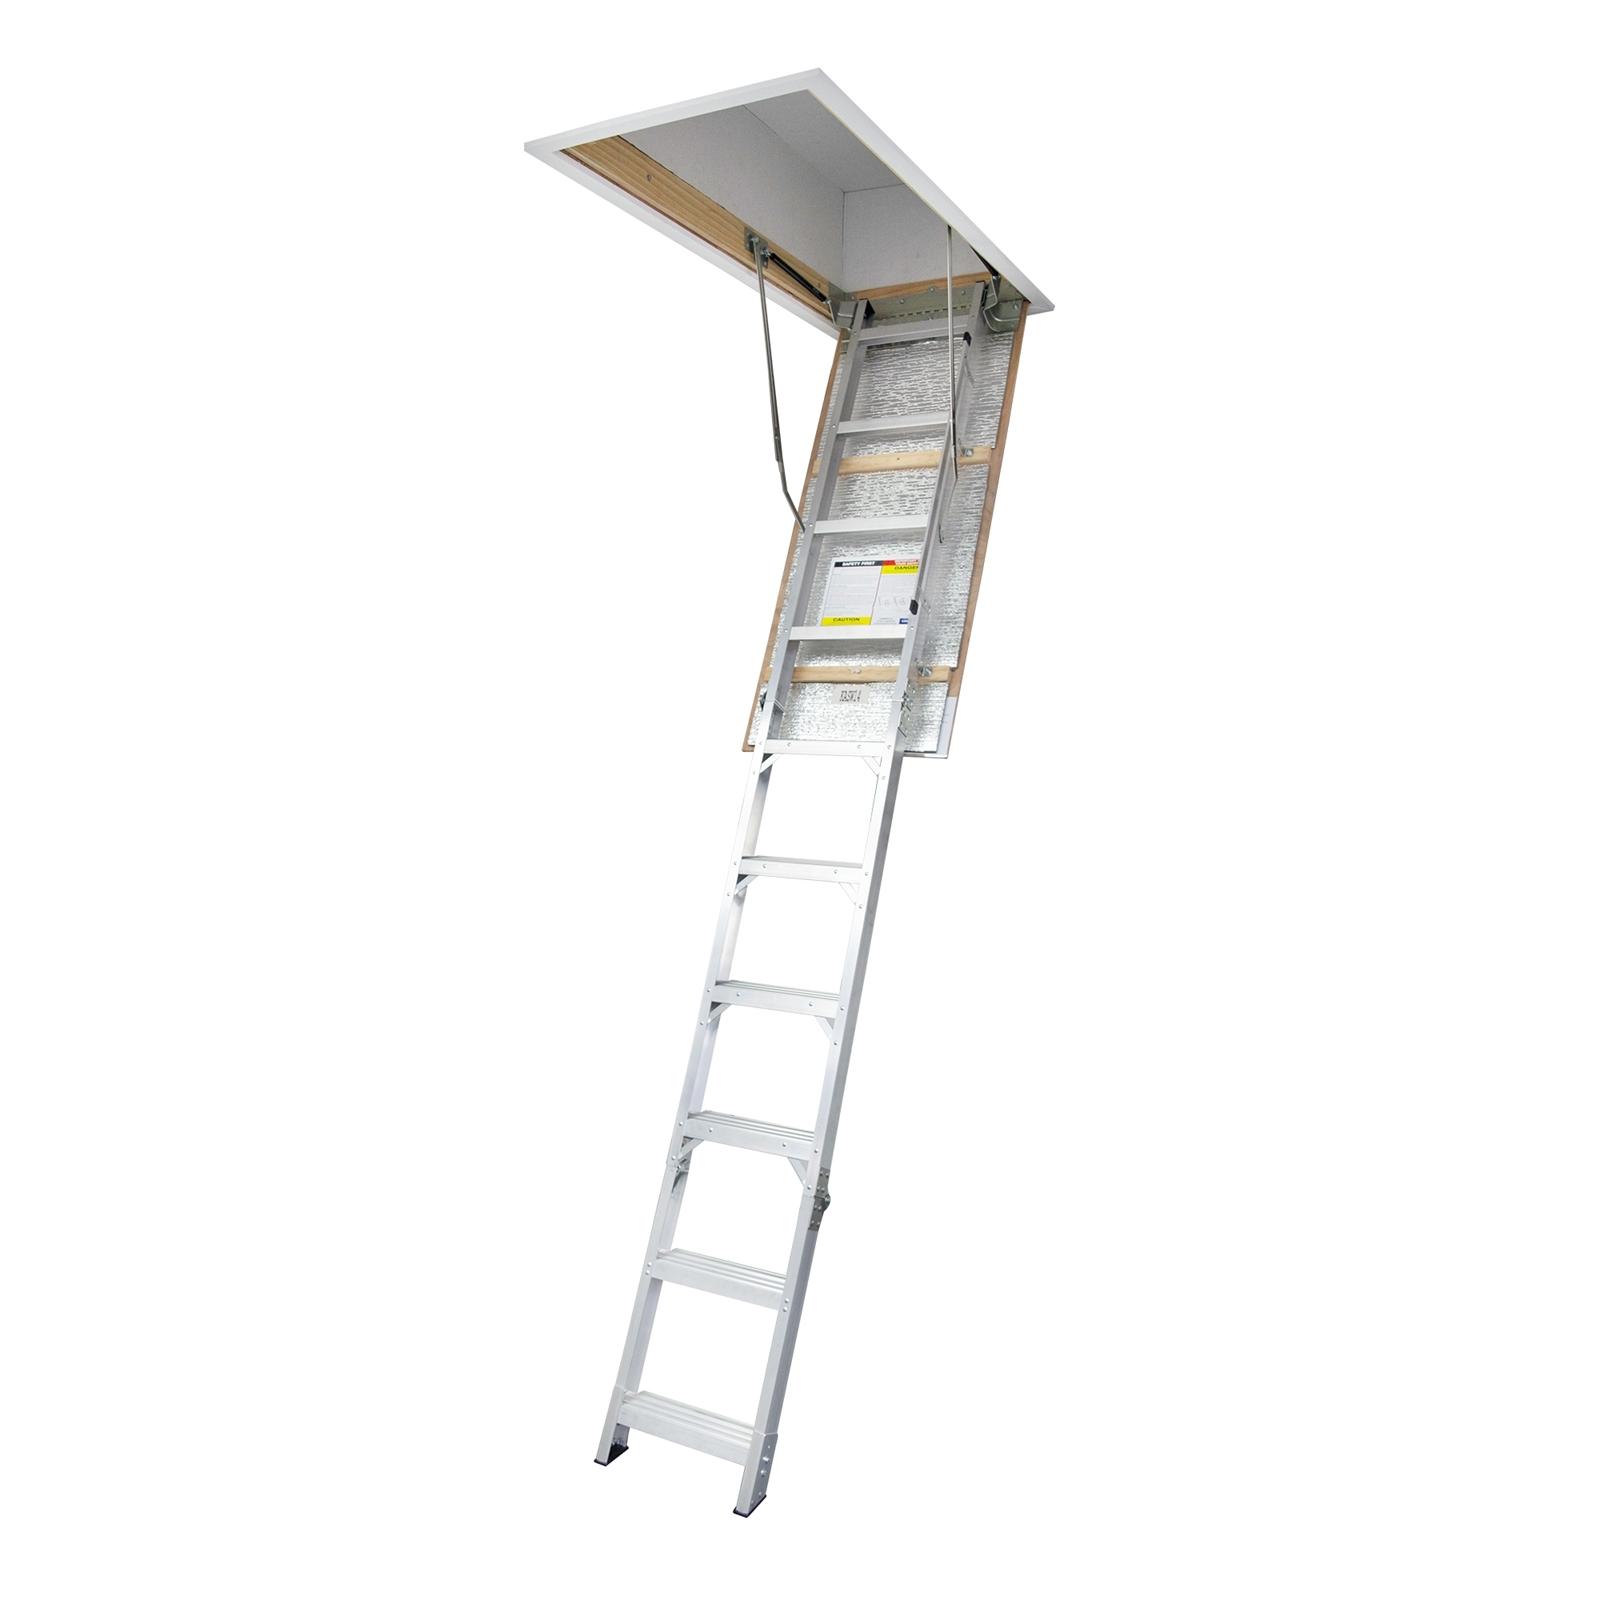 Kimberley 2.34 - 3.12m Trendline Aluminium Attic Ladder